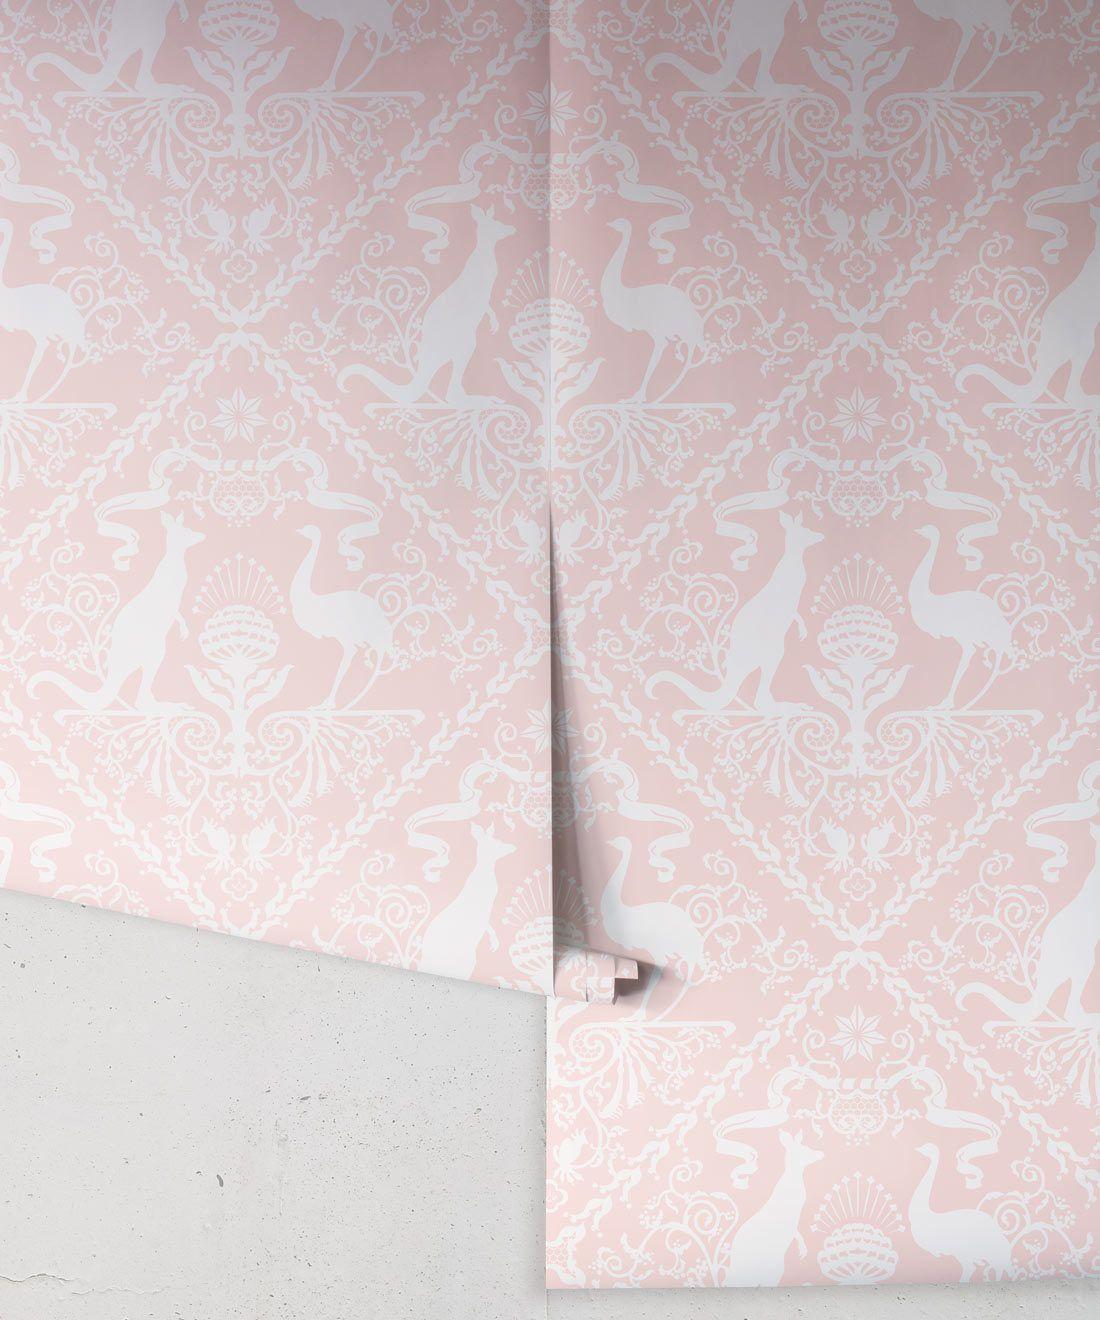 In Australia We Trust Coral • Australian Wallpaper •Australian Coat of Arms • Milton & King USA •Pink Wallpaper Rolls